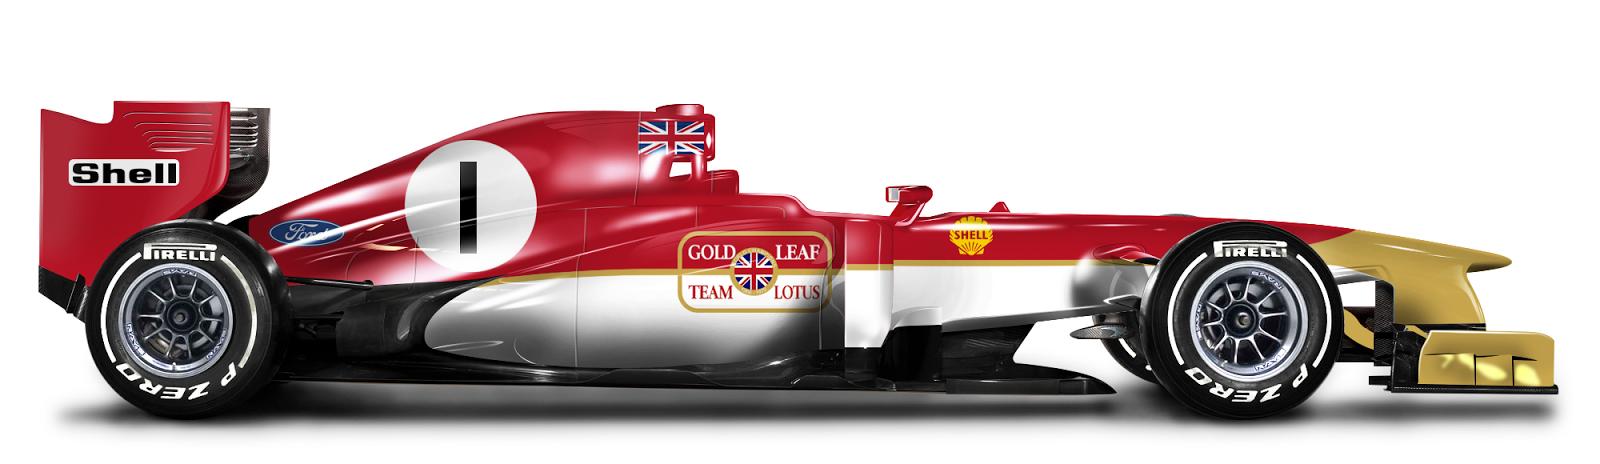 Lotus Gl Png 1 600 464 Pixels Formula 1 Race Cars Classic